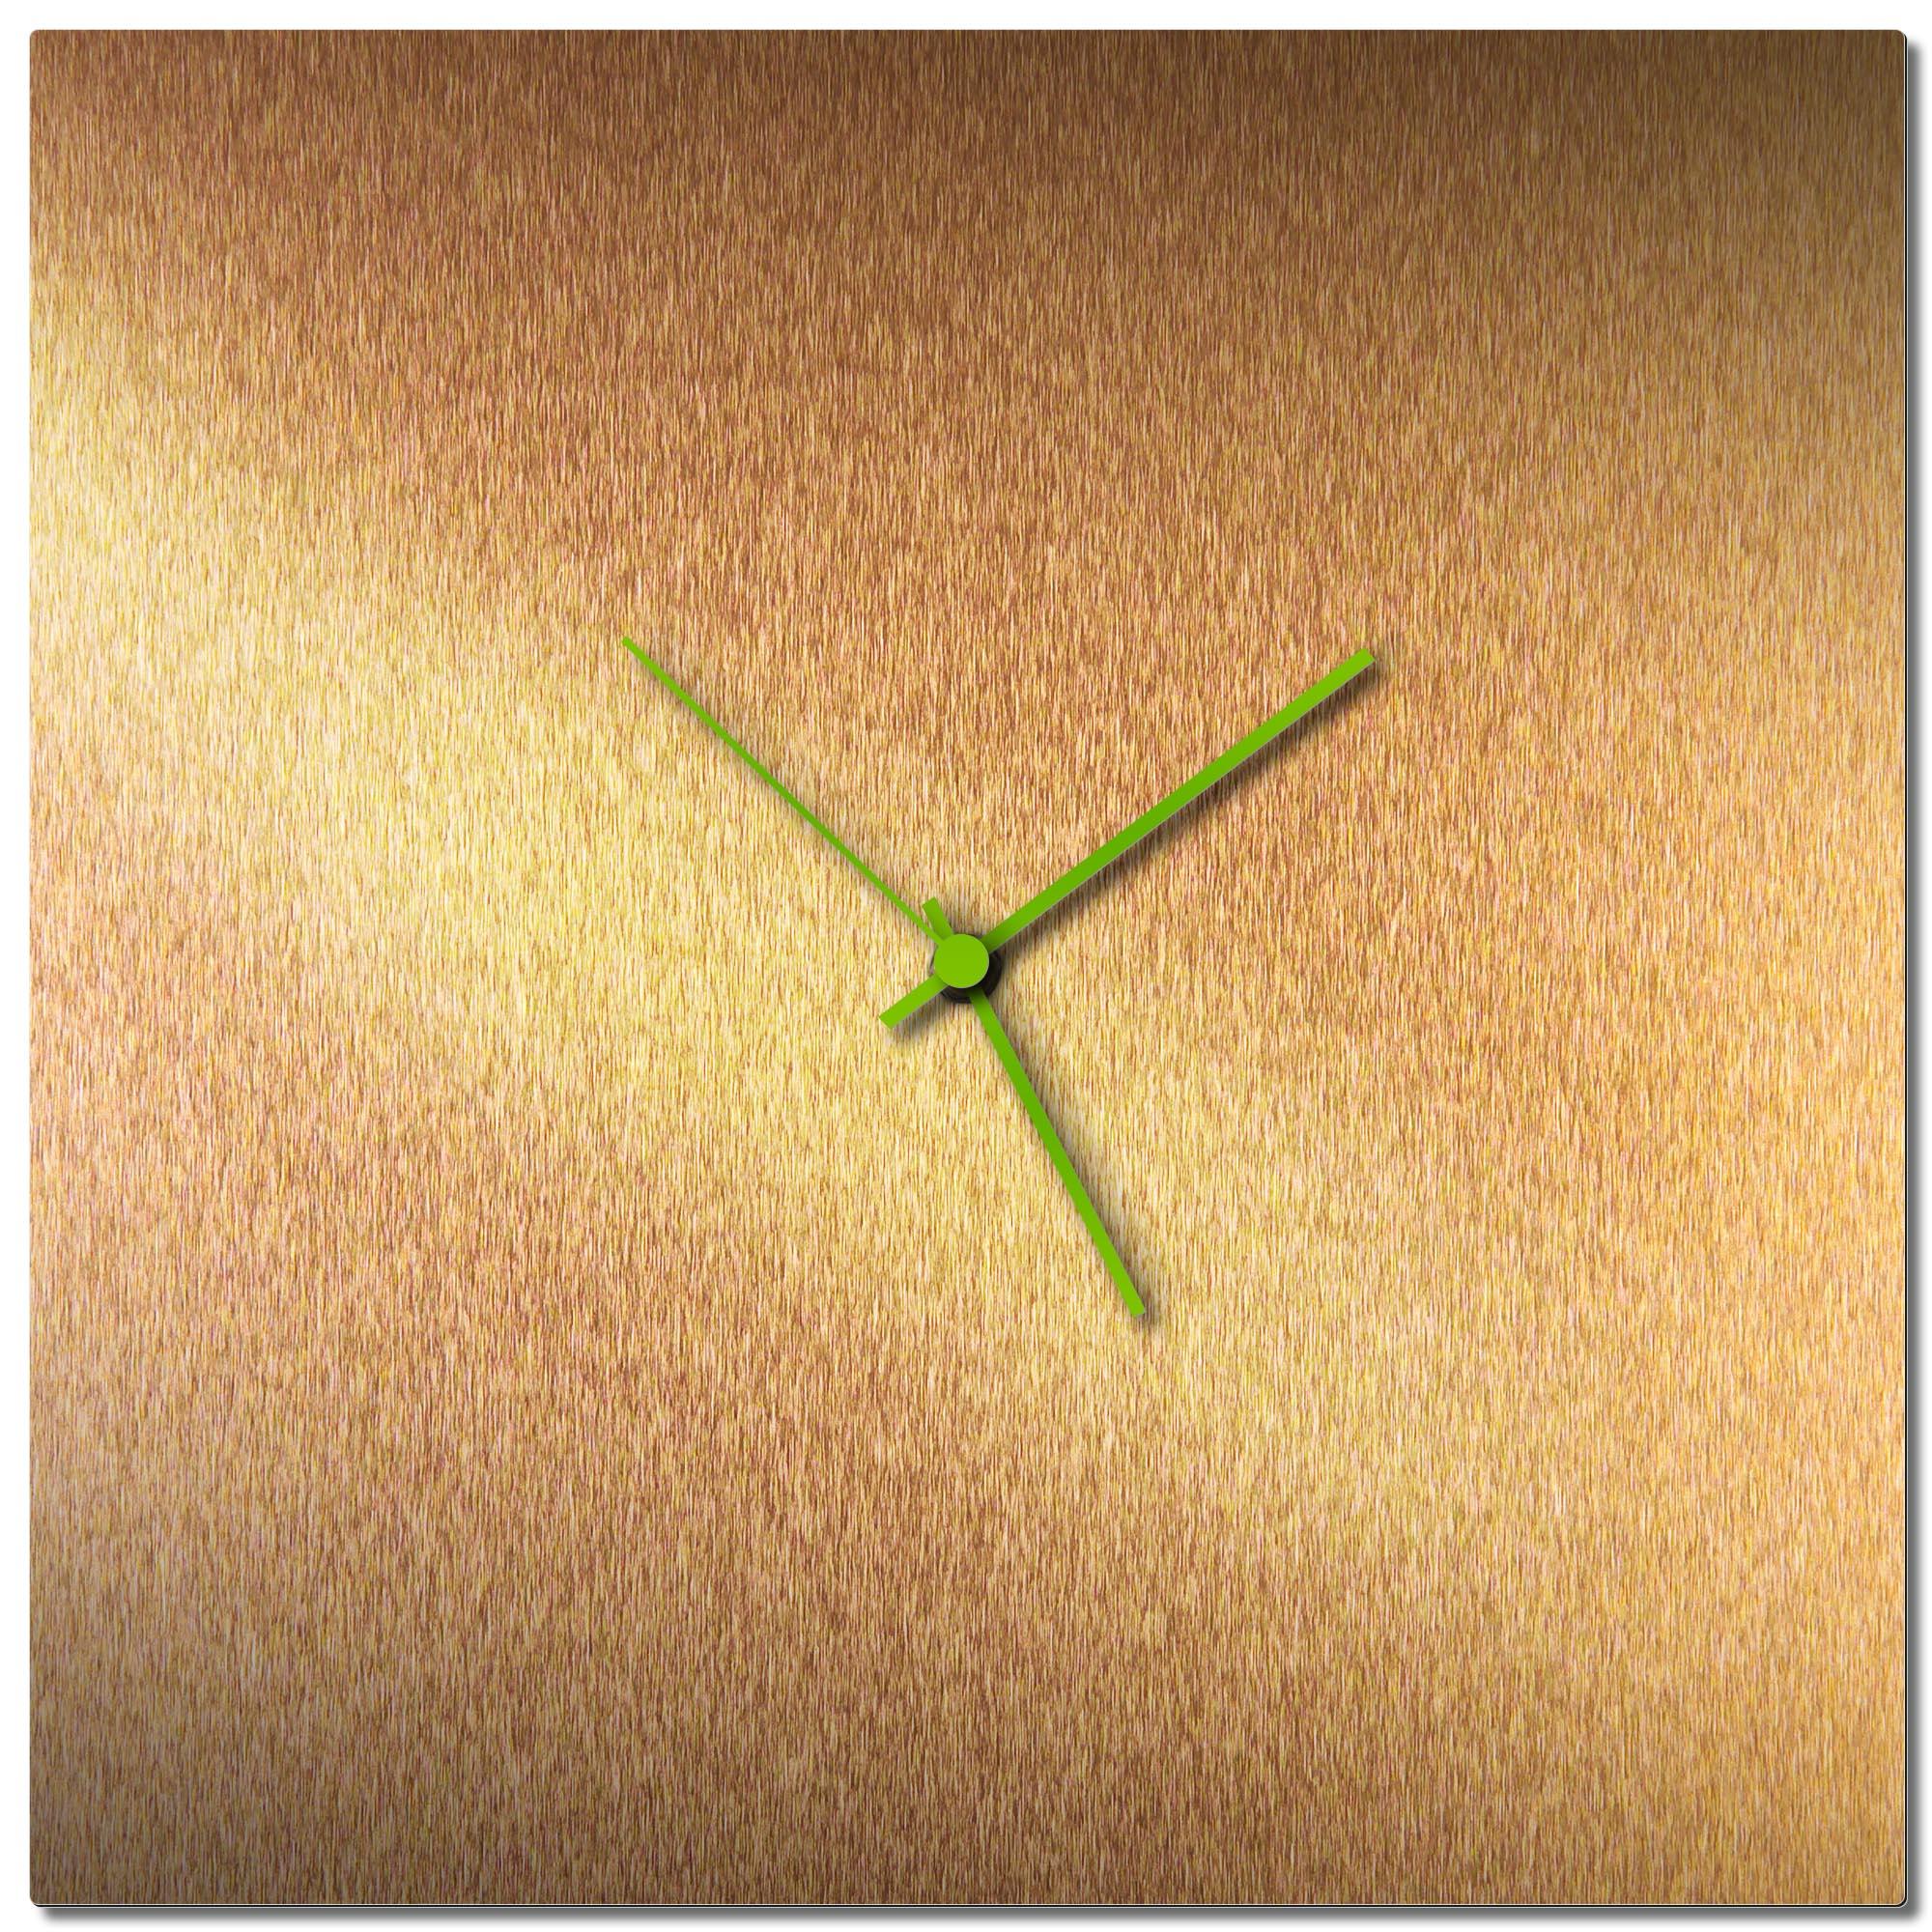 Adam Schwoeppe 'Bronzesmith Square Clock Green' Midcentury Modern Style Wall Clock